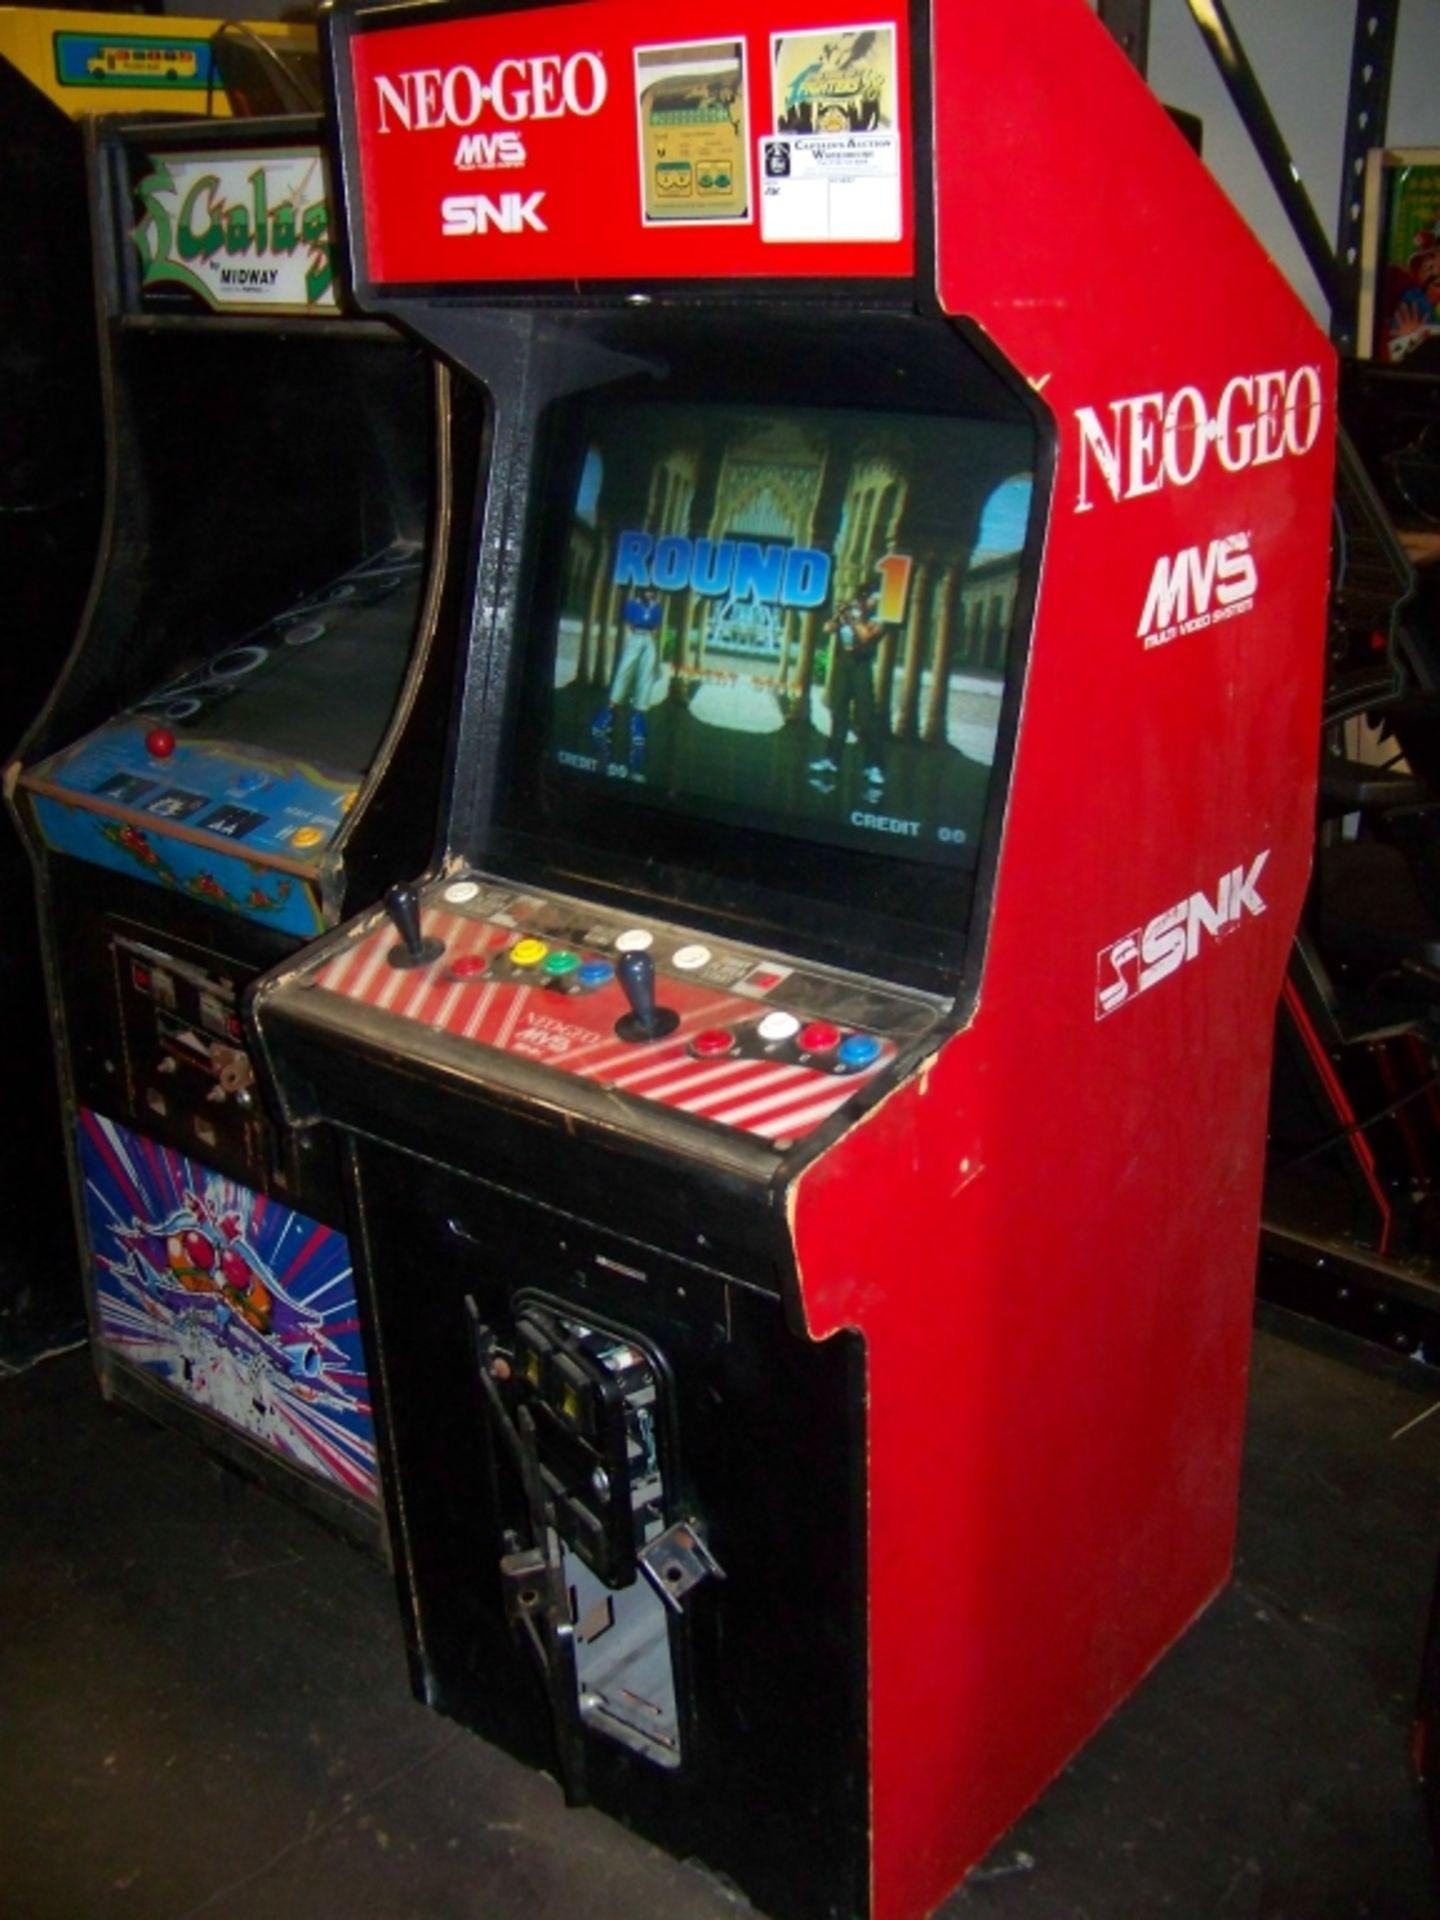 NEO GEO 2 SLOT ARCADE GAME SNK   AX - Image 2 of 2